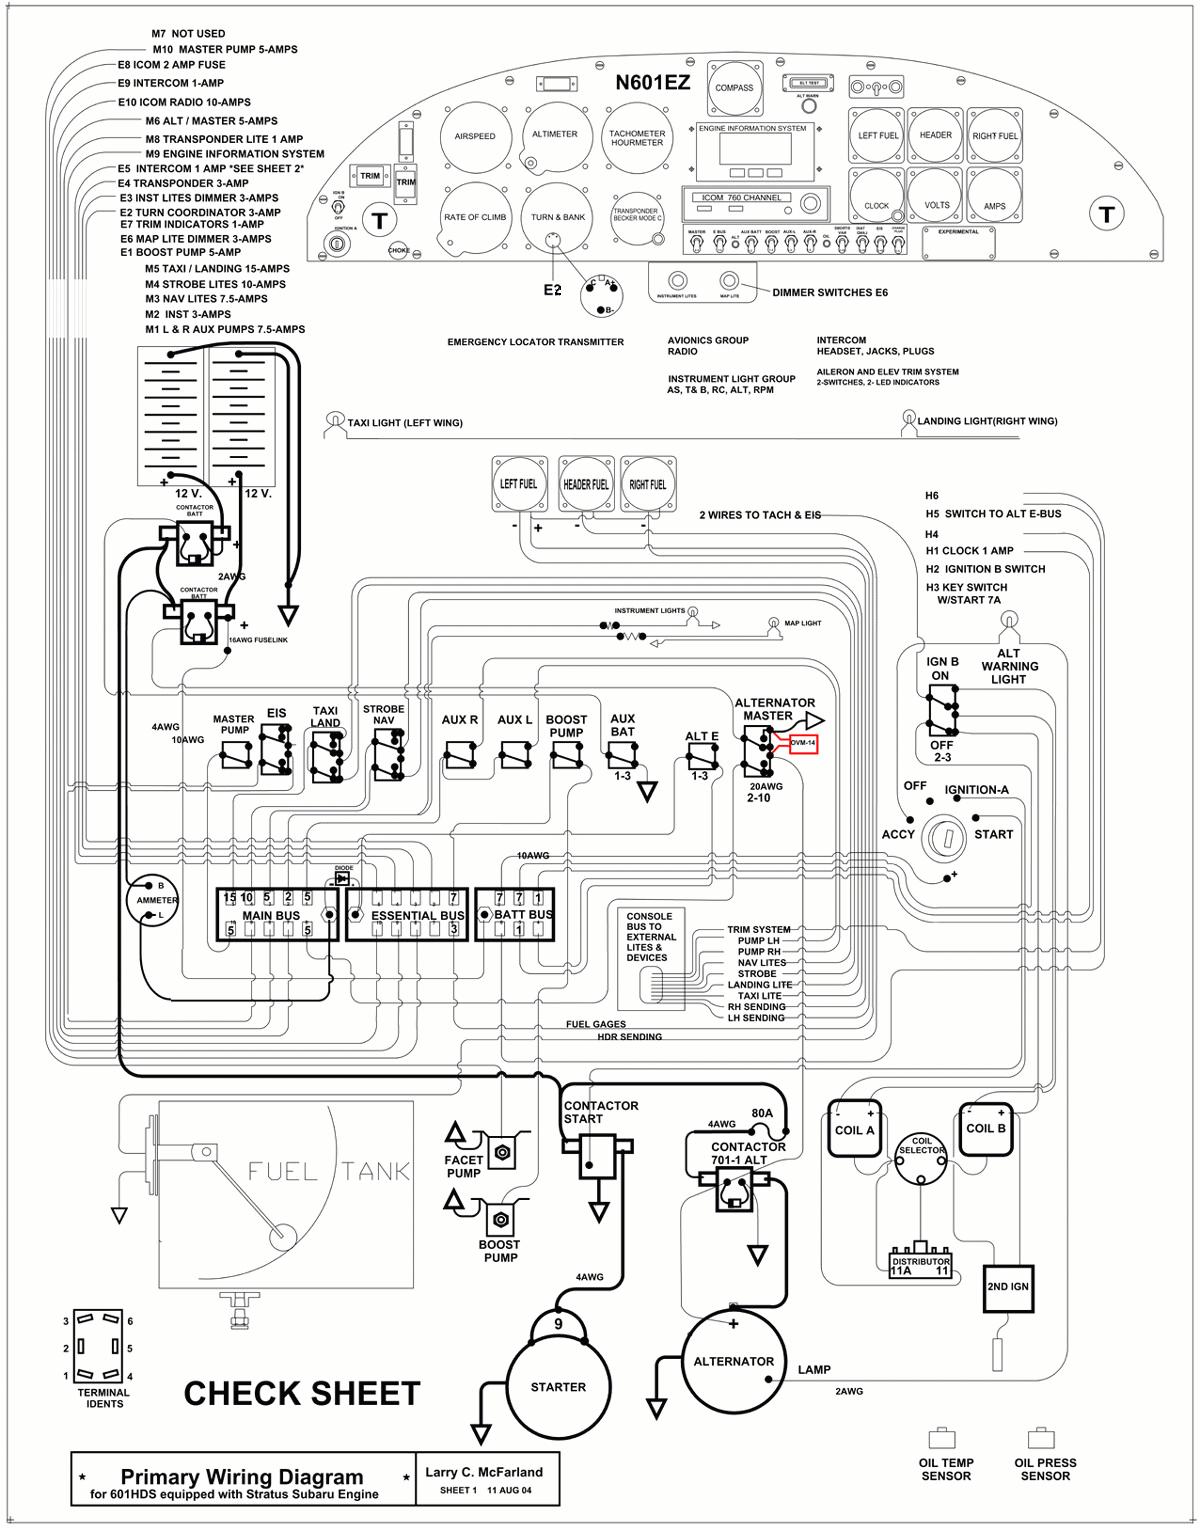 cessna 172 alternator wiring diagram wiring diagrams cessna alternator wiring schematic wiring diagram view cessna 172